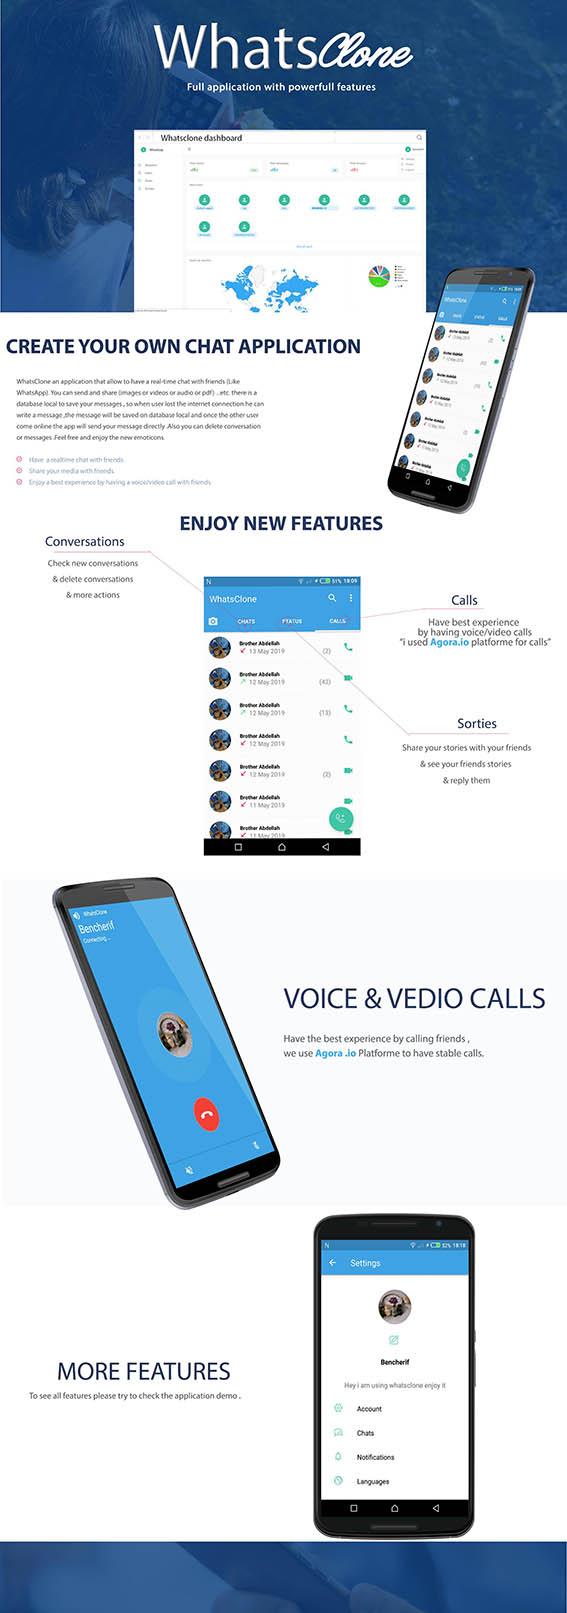 سورس اپلیکیشن پیام رسان مشابه واتس آپ | WhatsClone Messenger